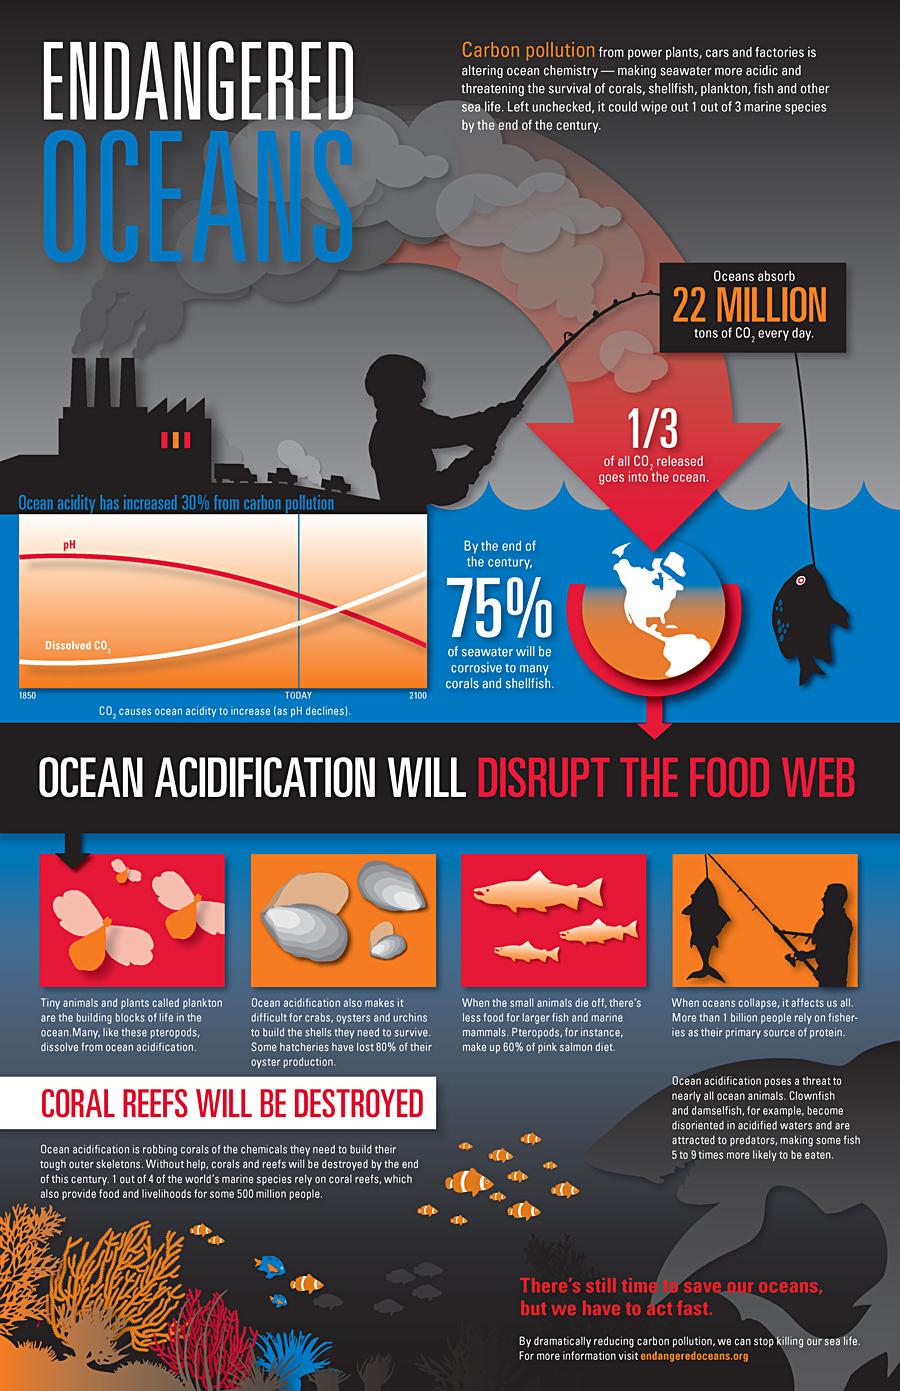 endangered oceans infographic